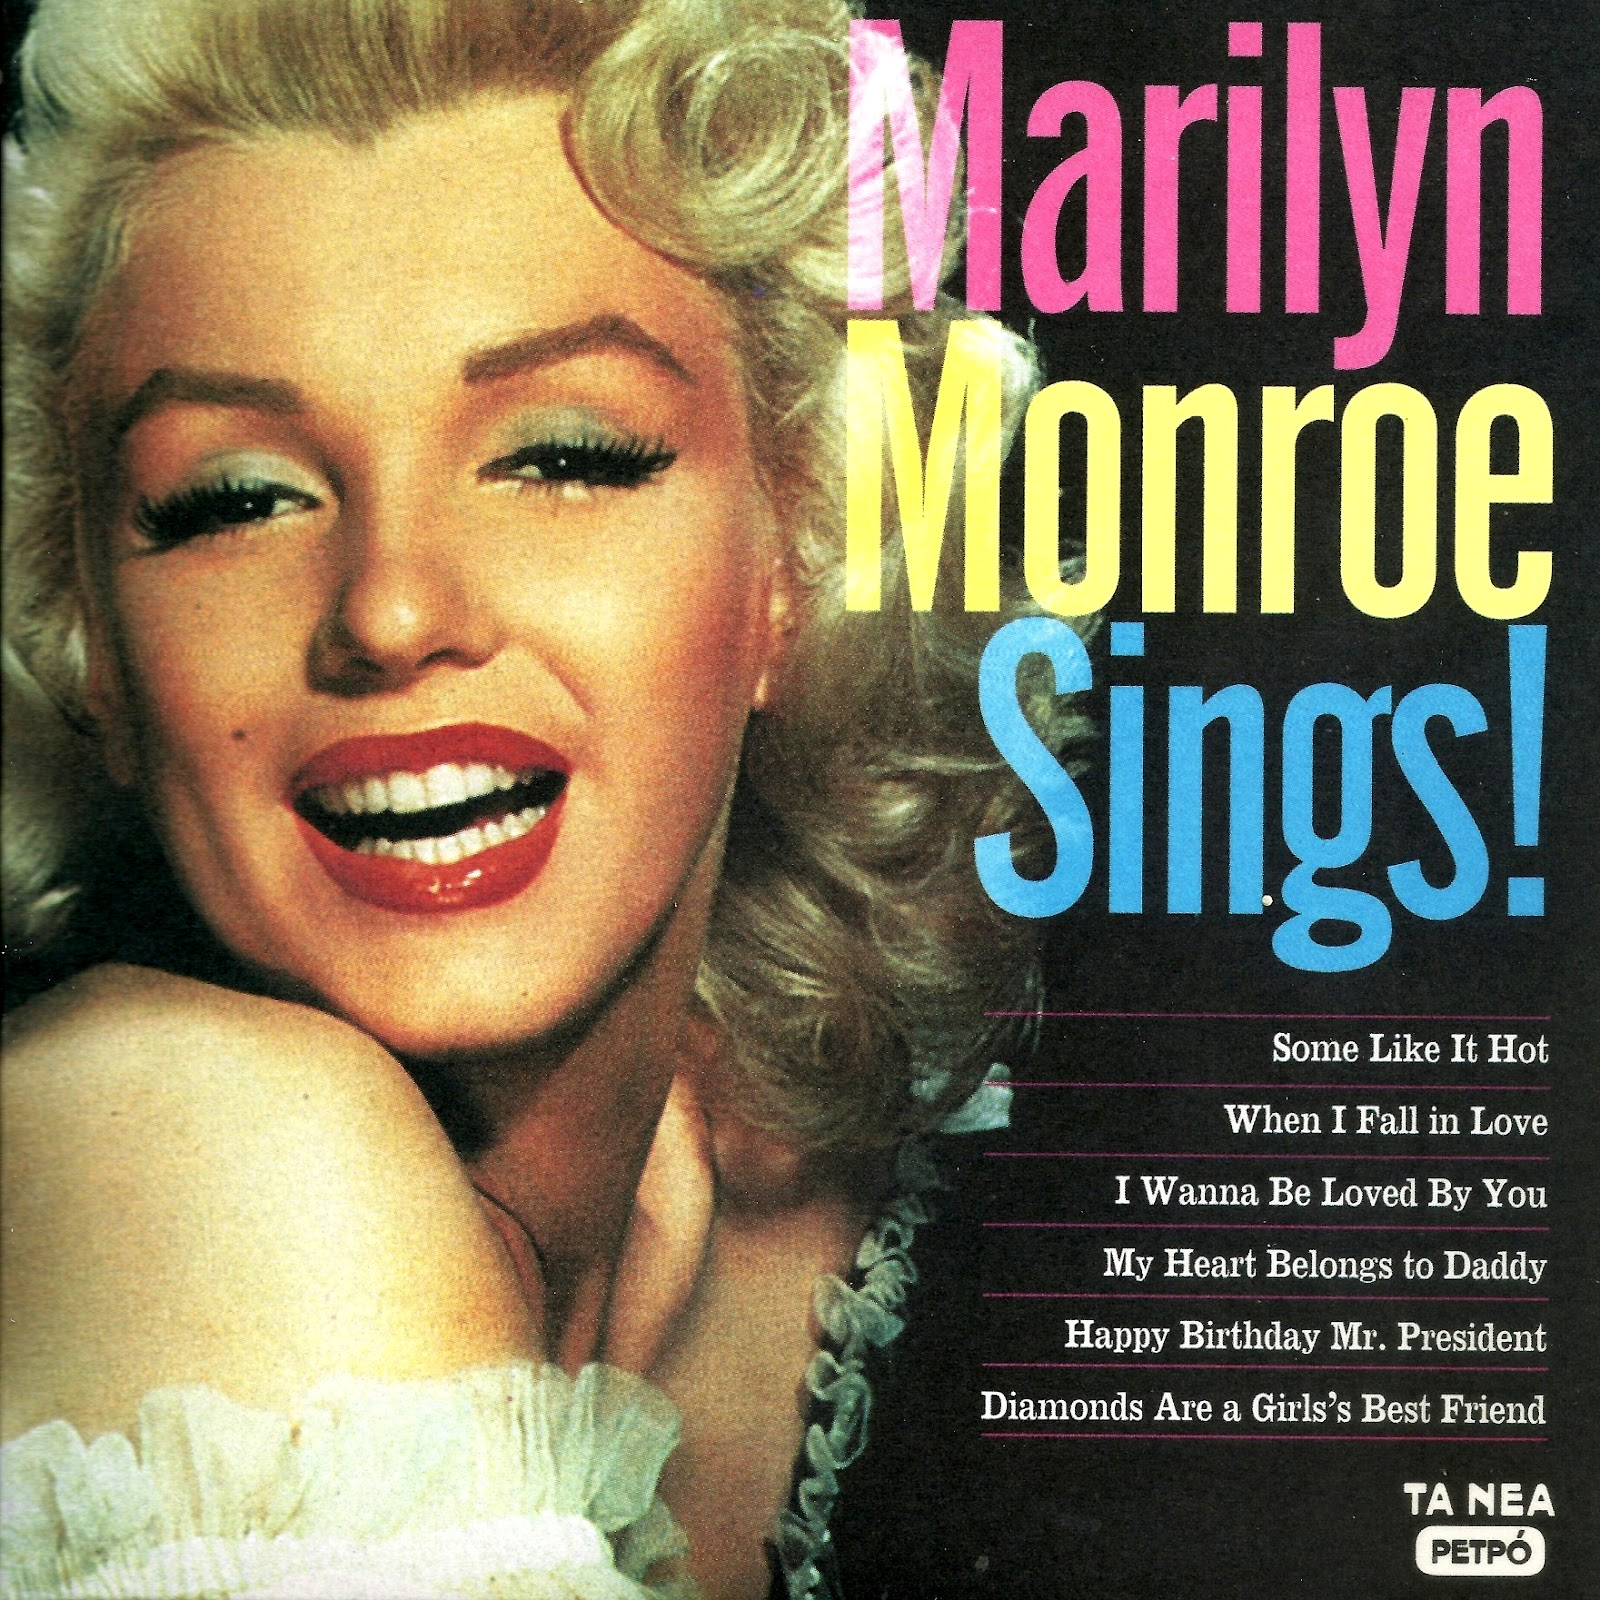 http://1.bp.blogspot.com/-q8qBk7qPYKg/UDOowg7VWhI/AAAAAAAADnQ/tYwJrLiFWZU/s1600/Marilyn+Monroe+Sings%2521+0.jpg